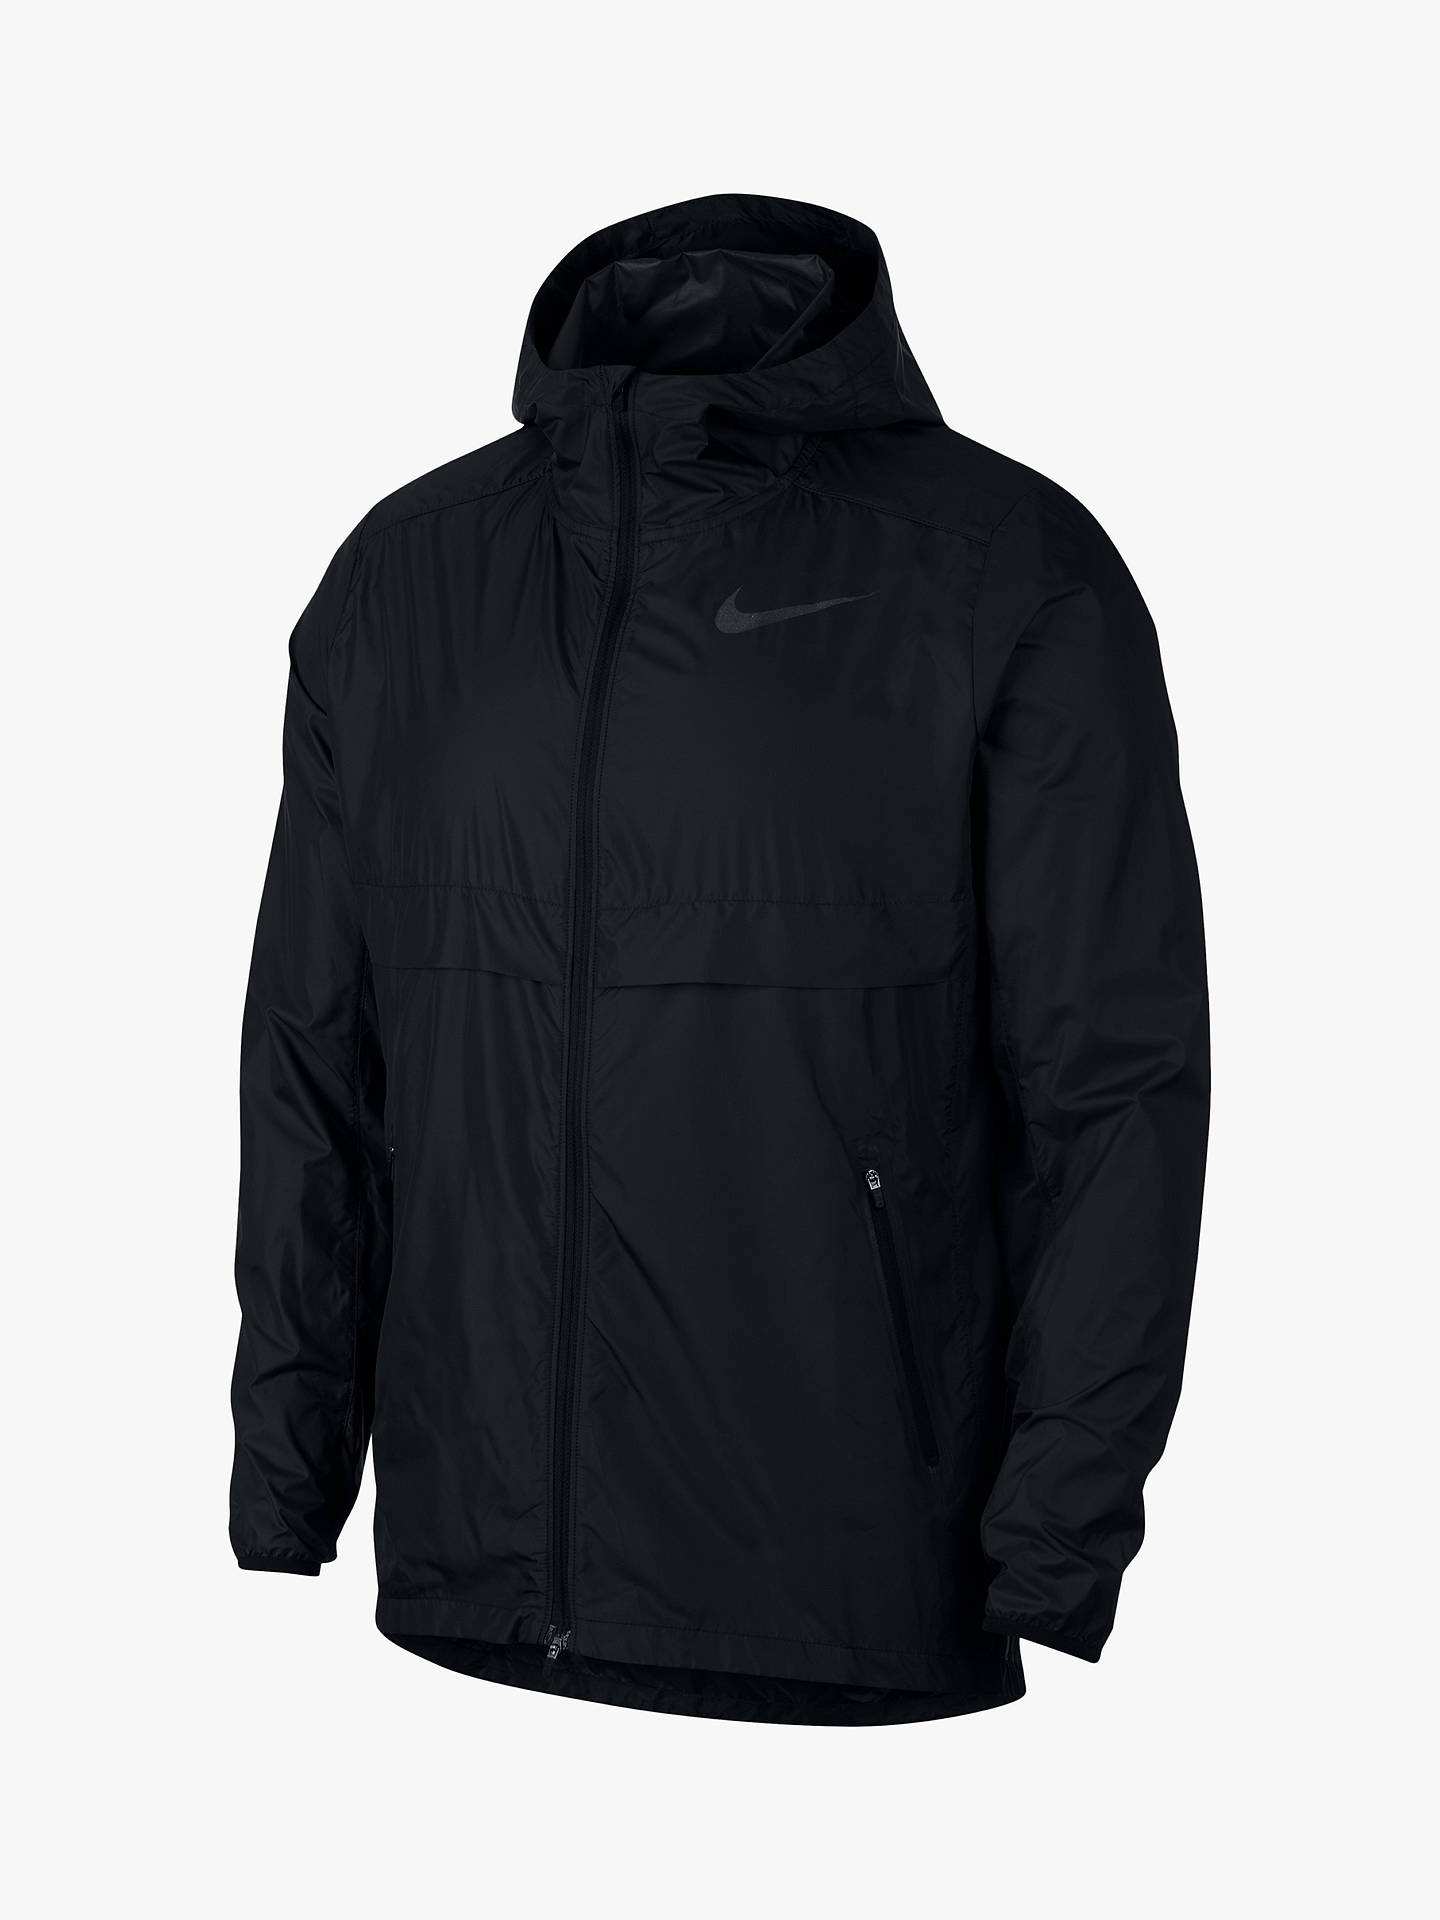 7b518f3e9756 Buy Nike Shield Men s Running Jacket